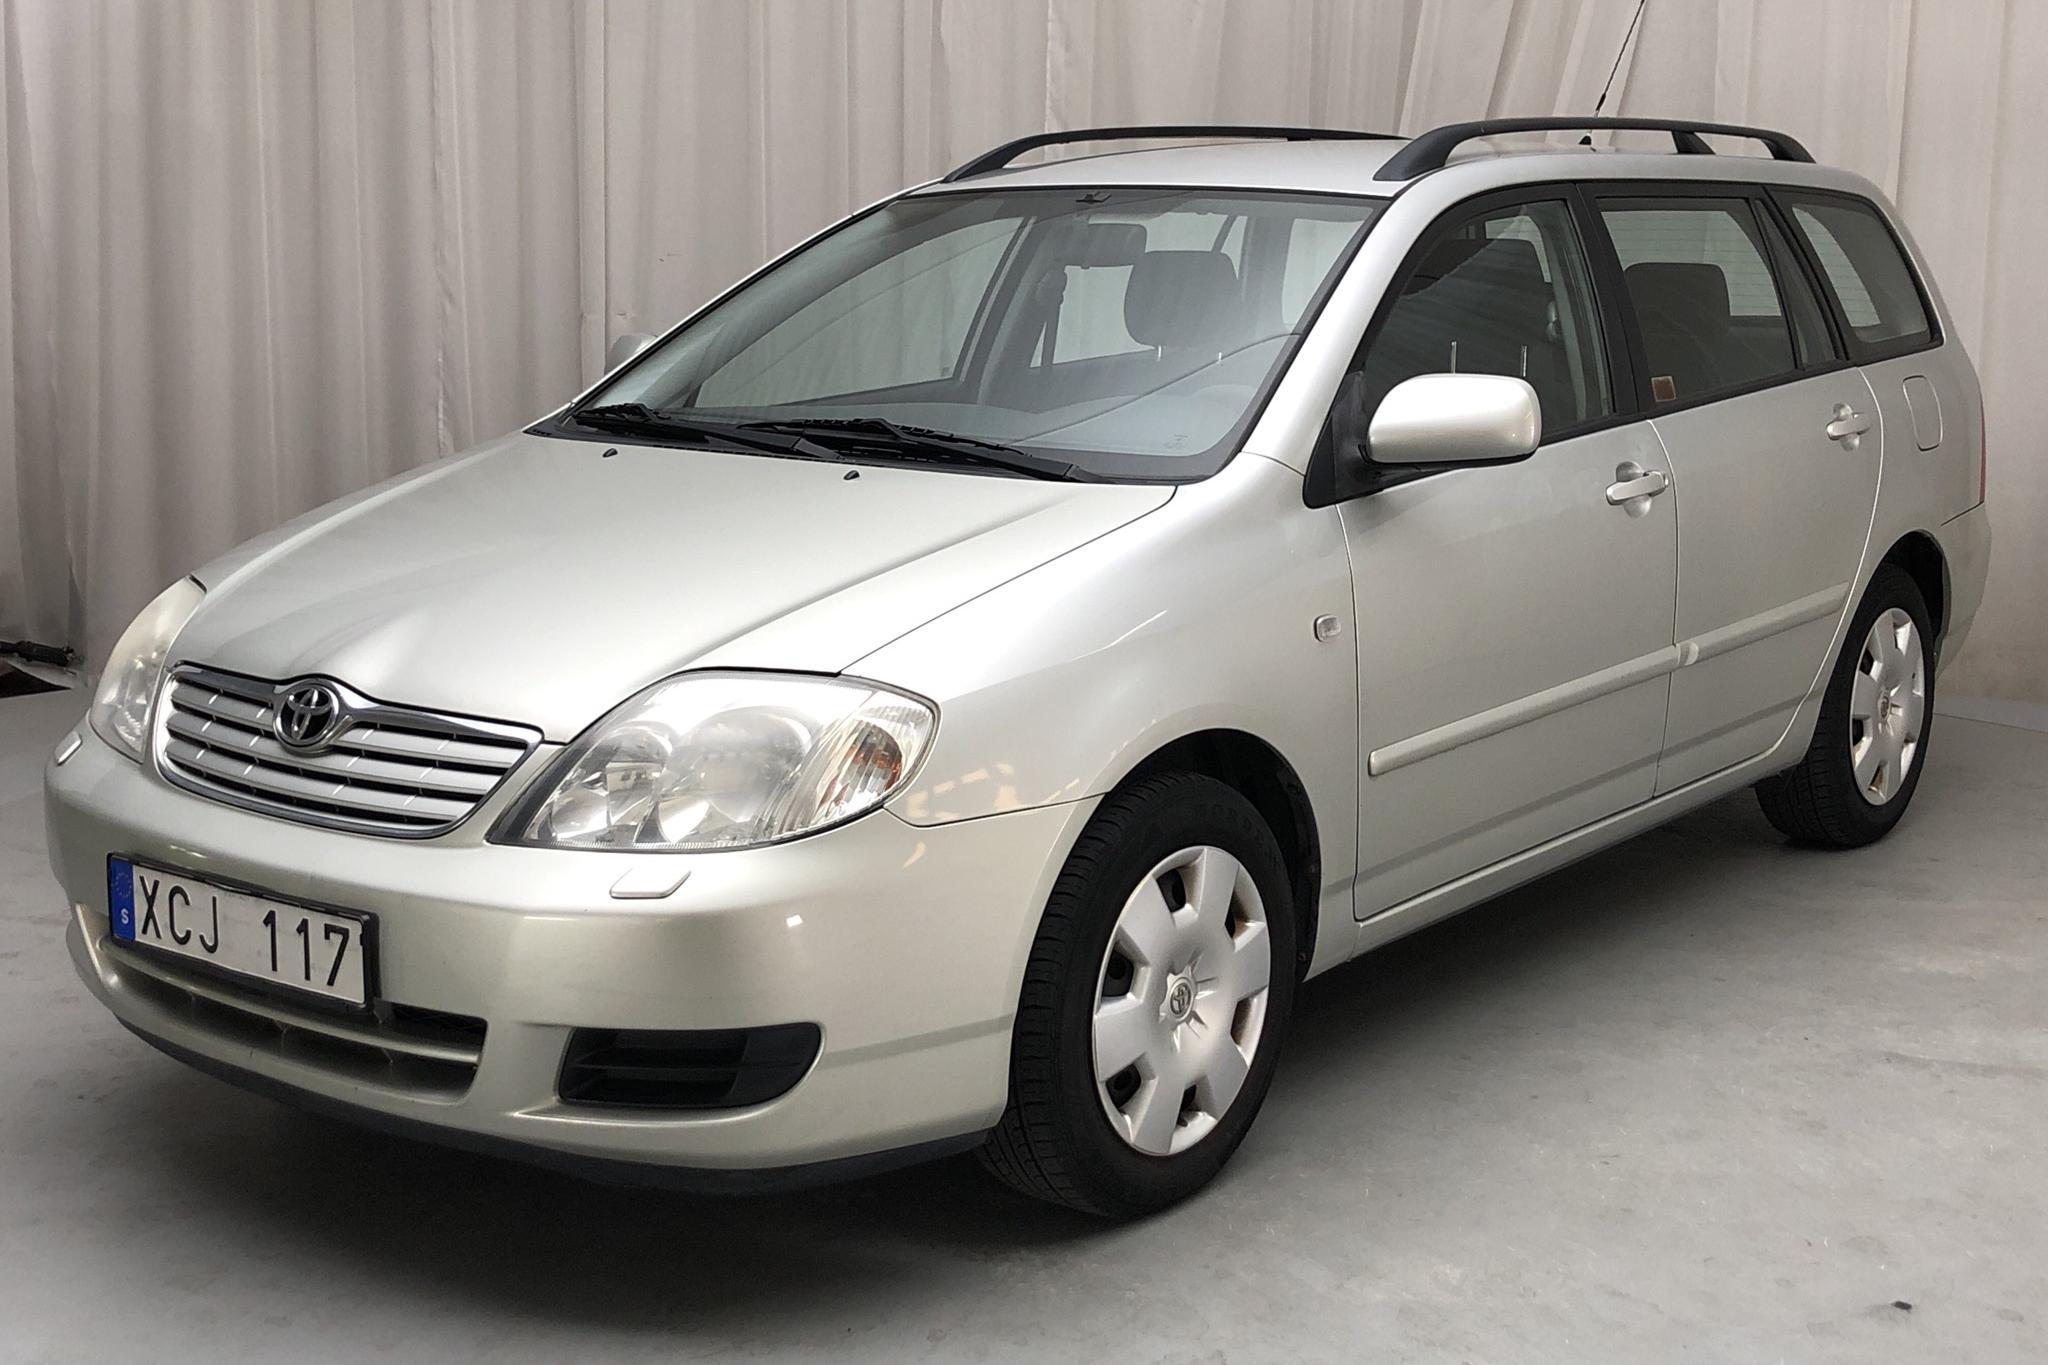 Toyota Corolla 1.6 Touring (110hk)